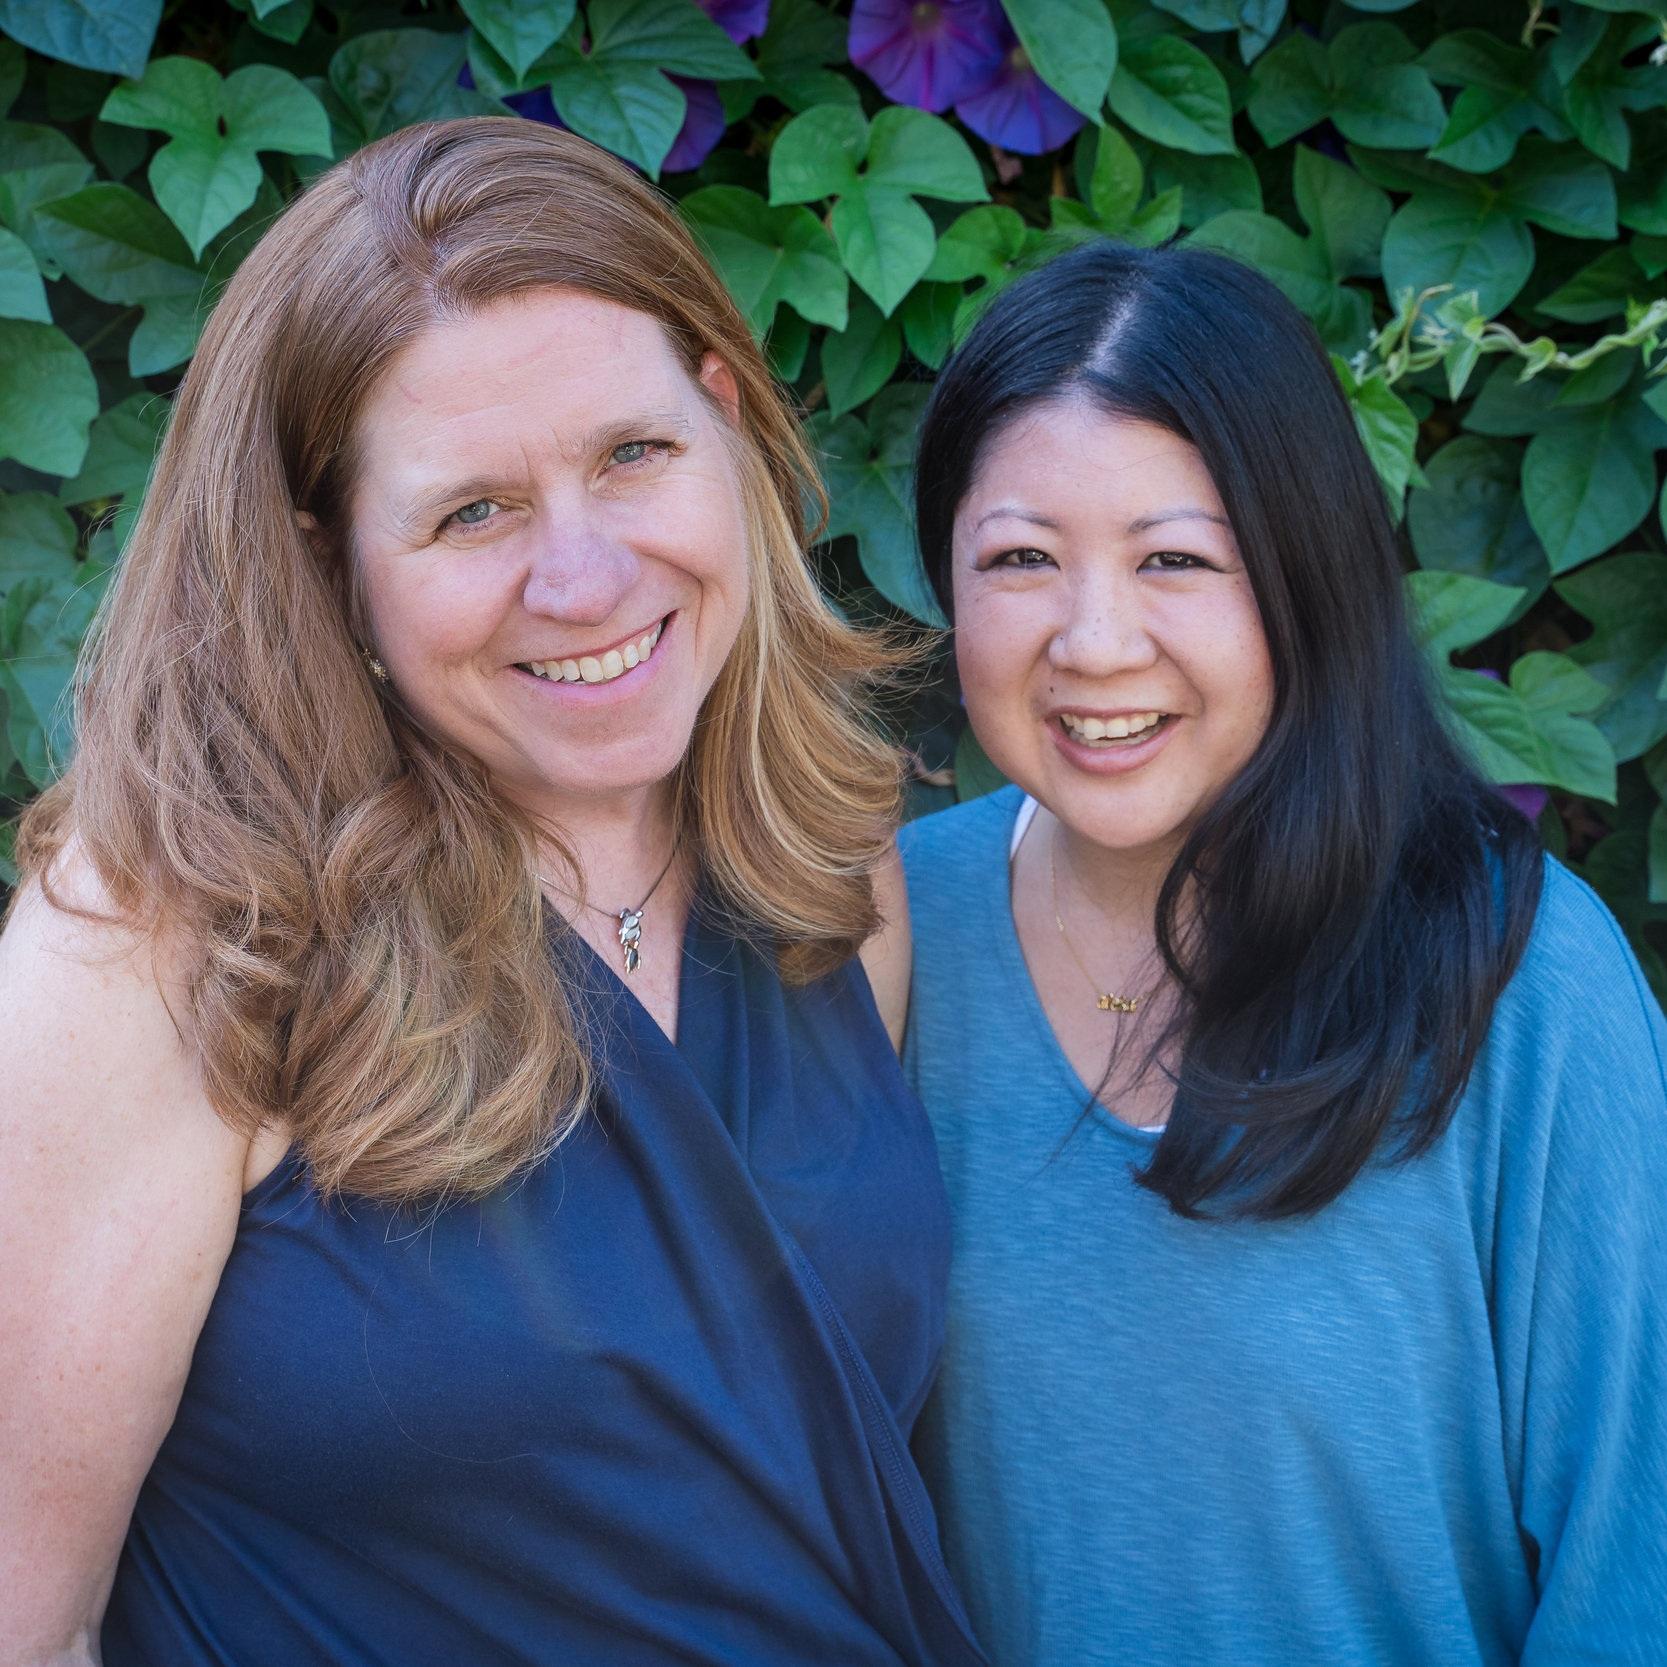 Vanessa fiske and lori shen, founders of she lives aloha